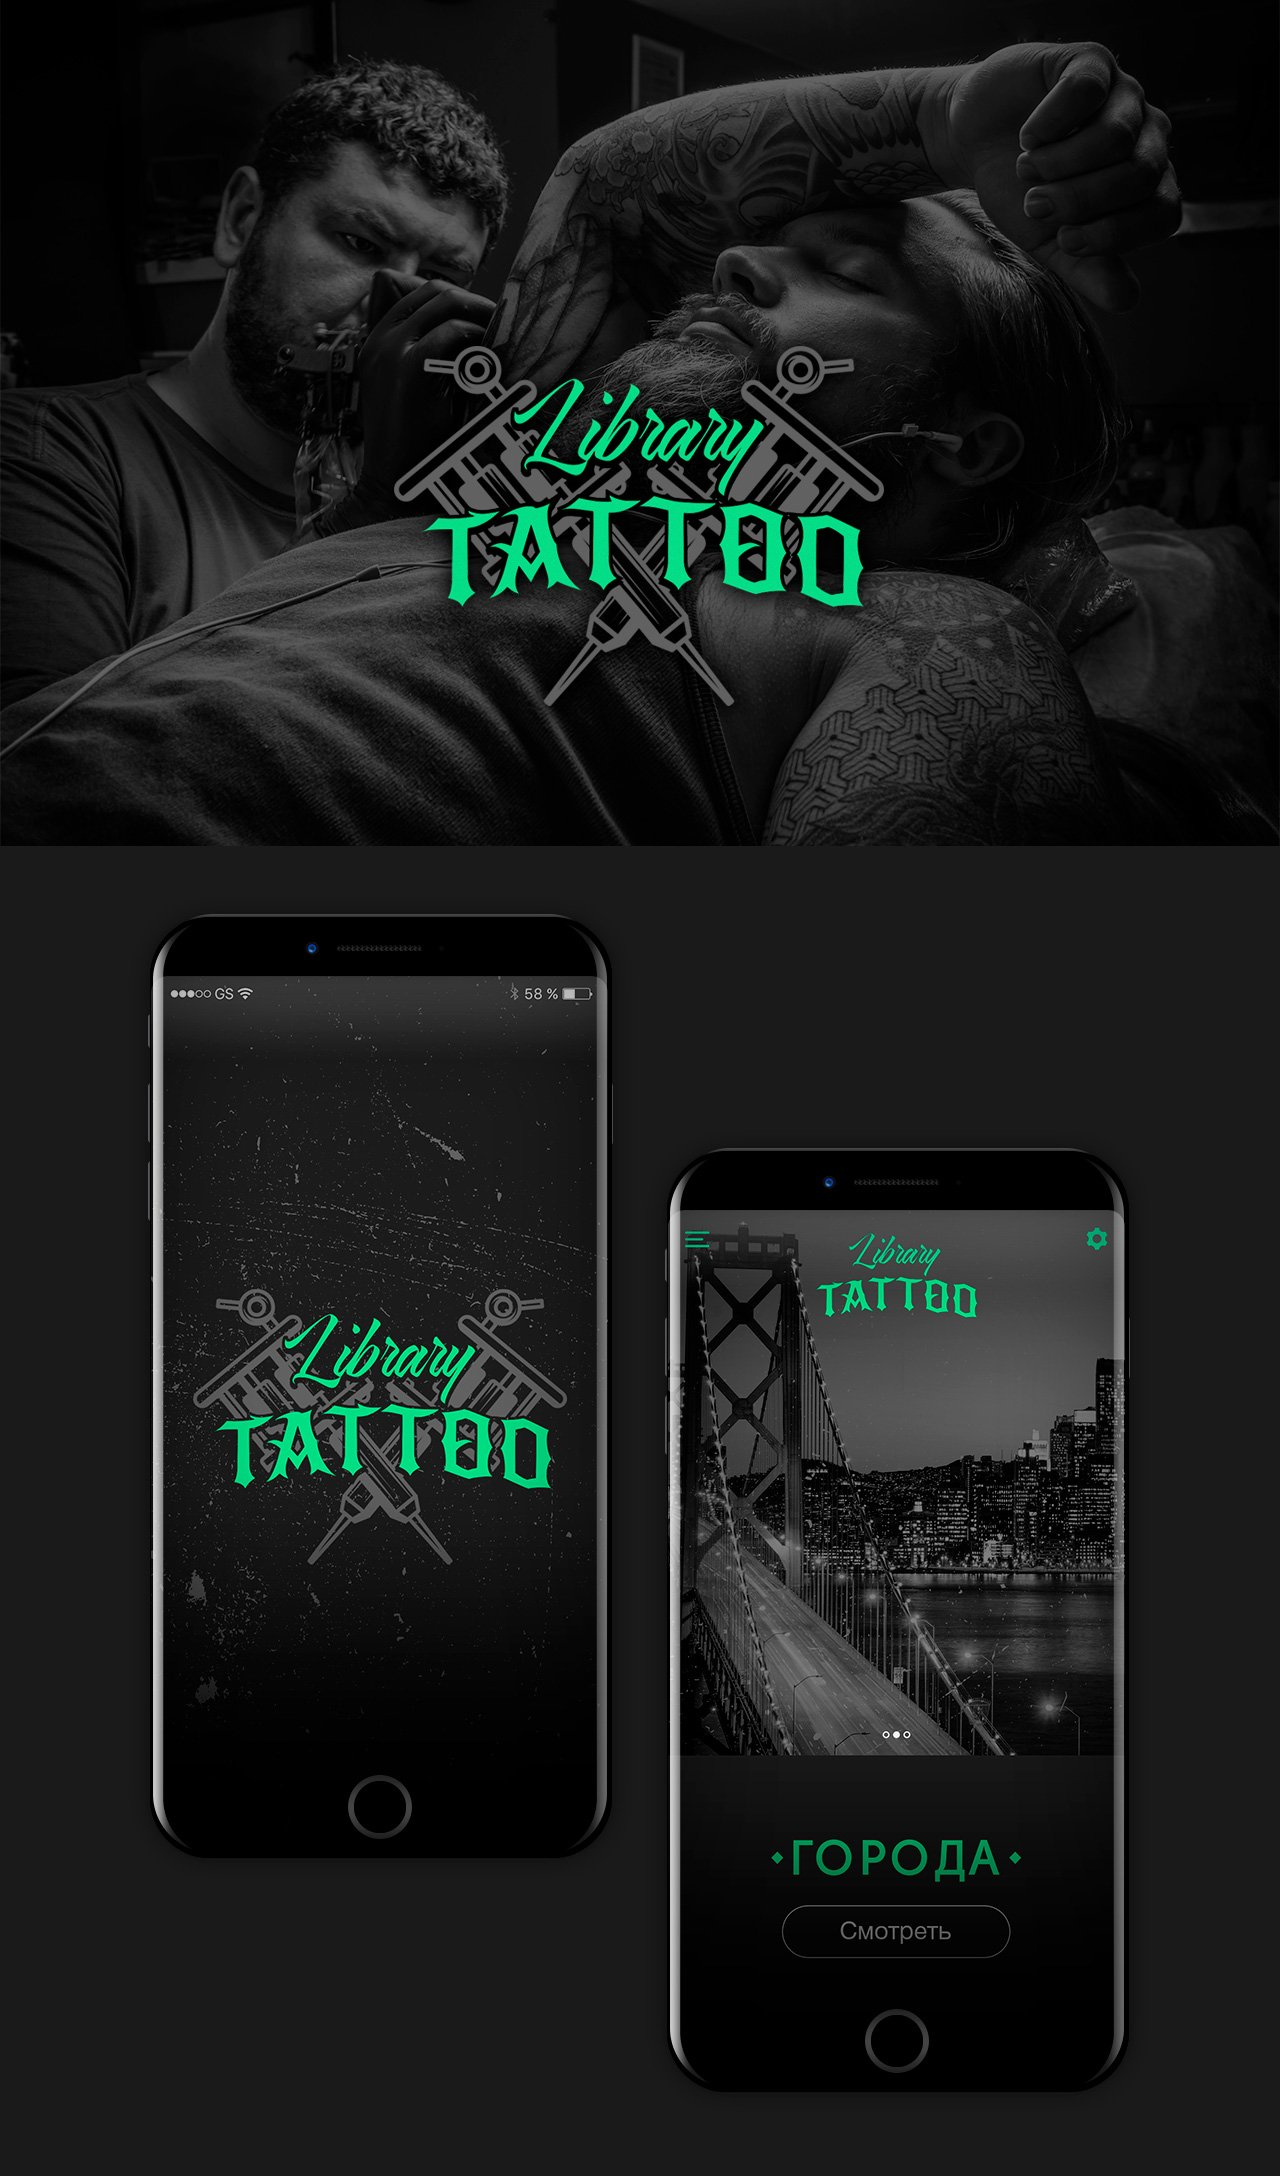 Library_tattoo-01